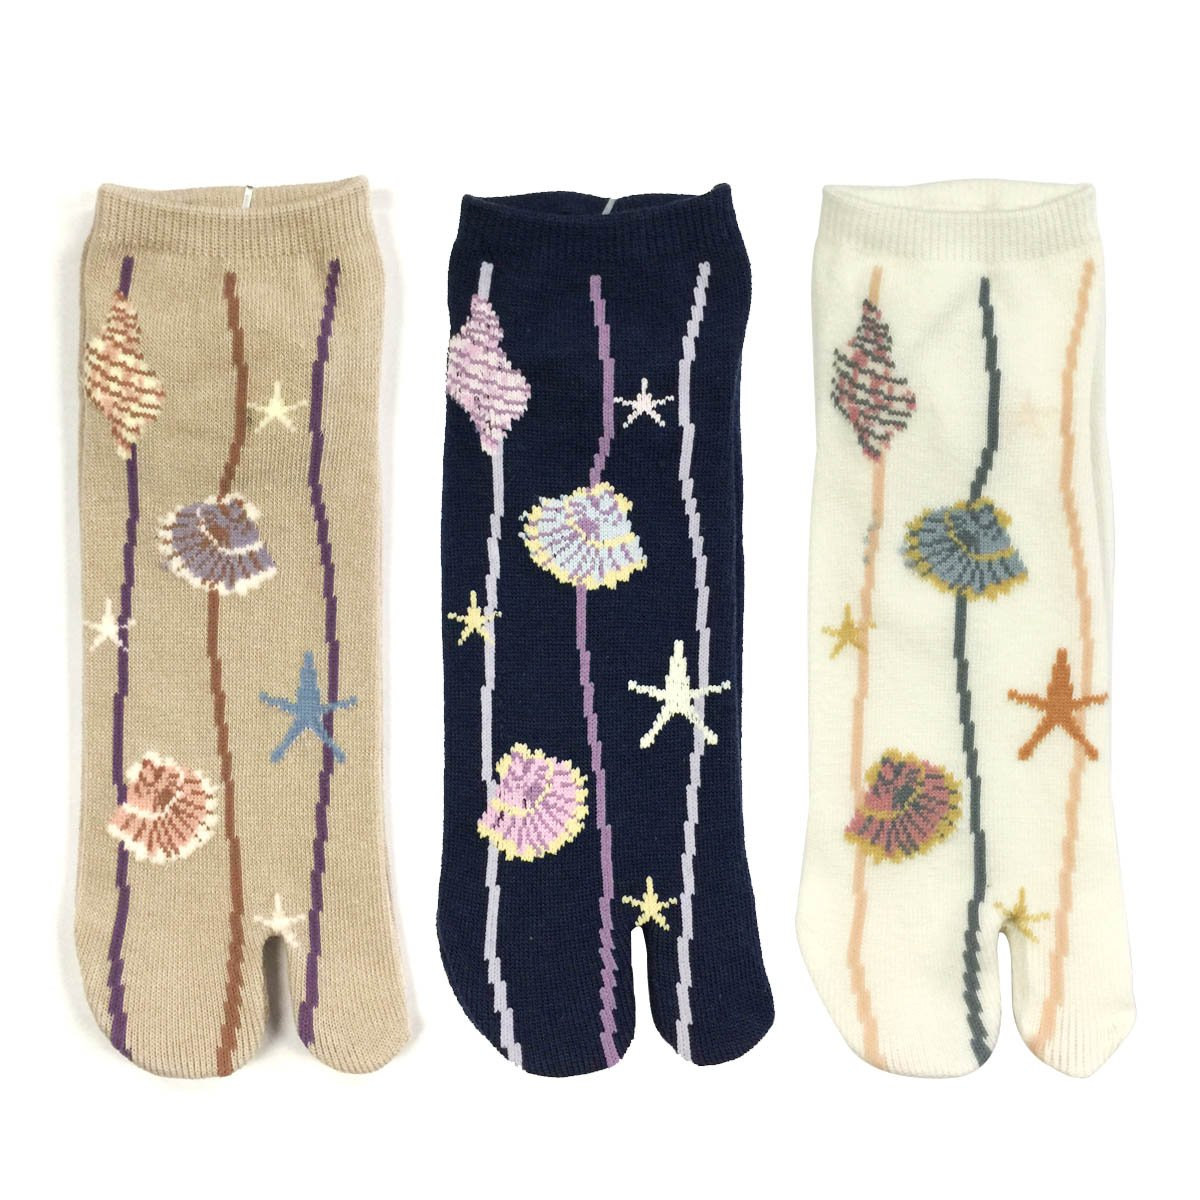 Wrapables Tabi Flip-Flop Socks (Set of 3), Ankle Length Seashells